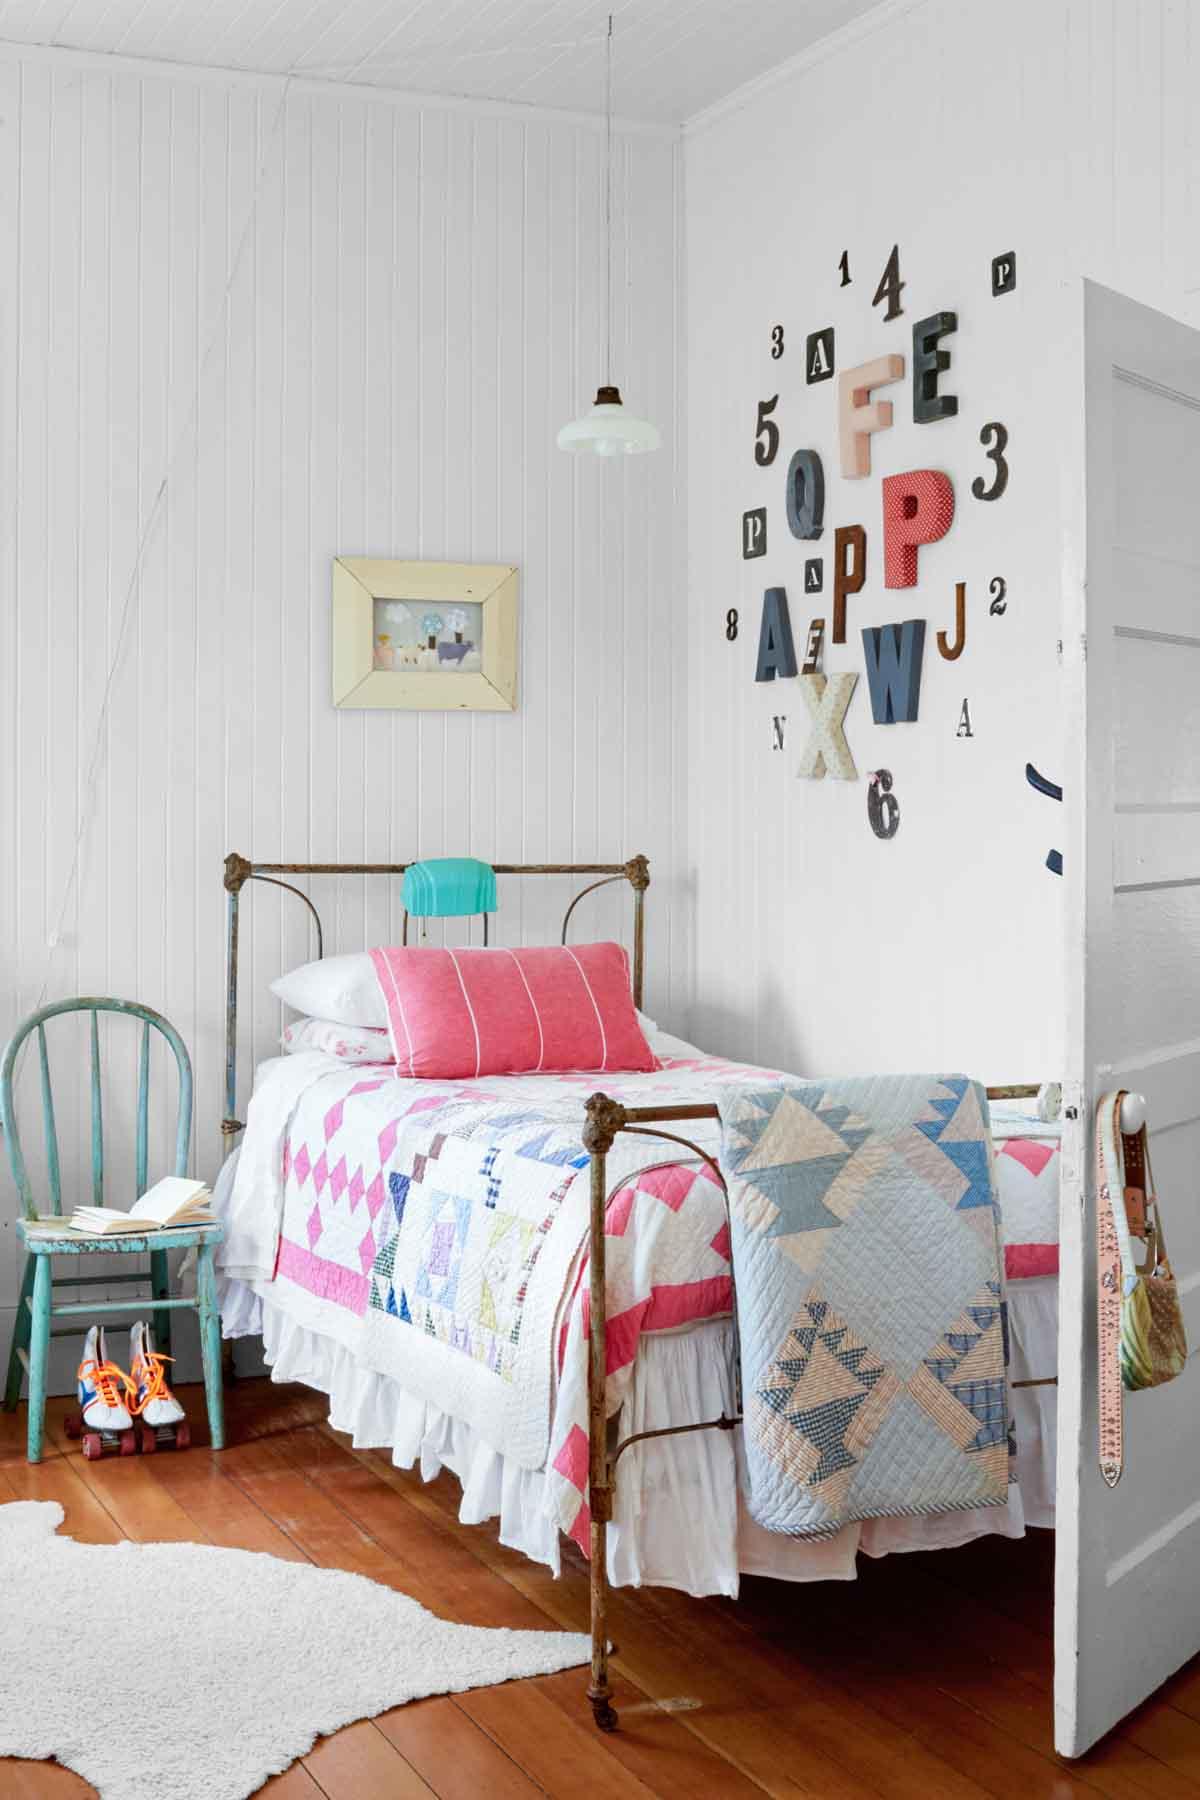 12 Fun Girl's Bedroom Decor Ideas - Cute Room Decorating ... on Room Decoration Girl  id=41067